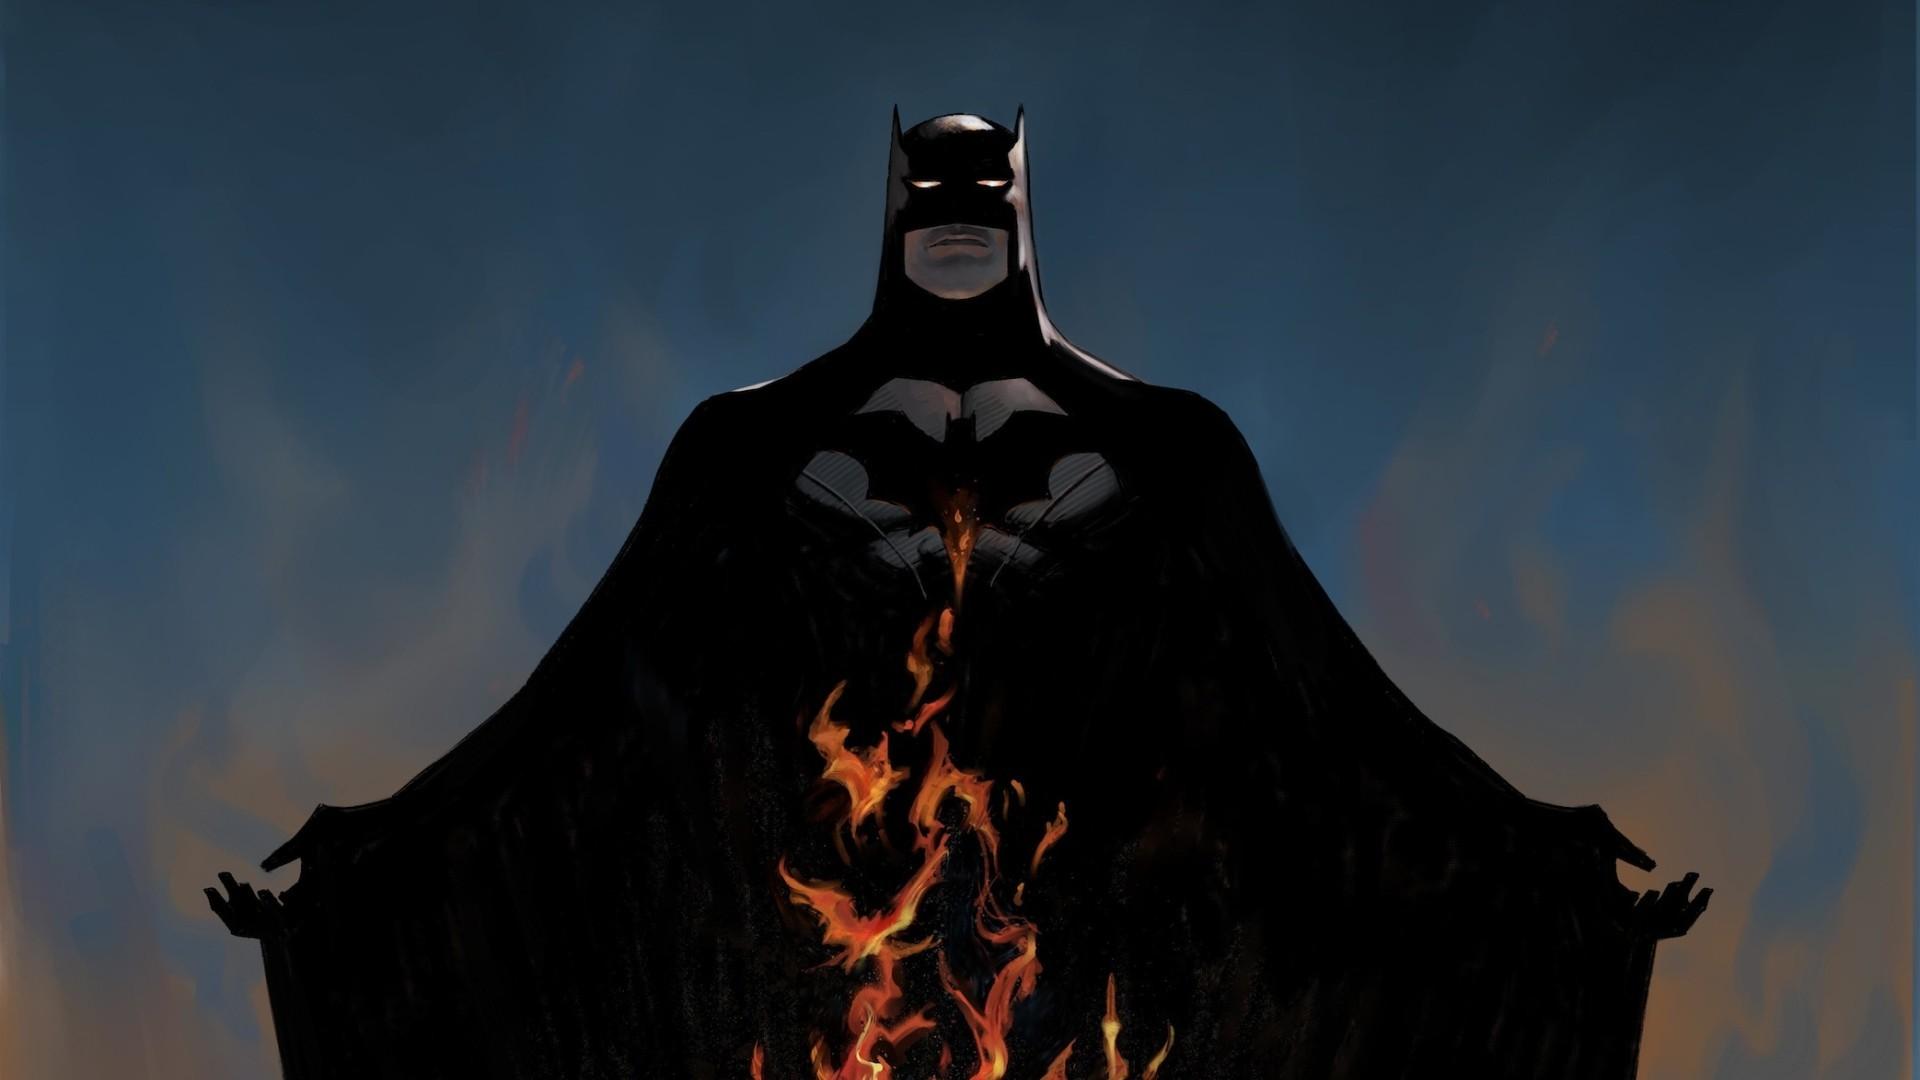 Batman HD Wallpapers, Desktop Backgrounds, Mobile Wallpapers Batman HD  Wallpapers For Desktop Wallpapers)